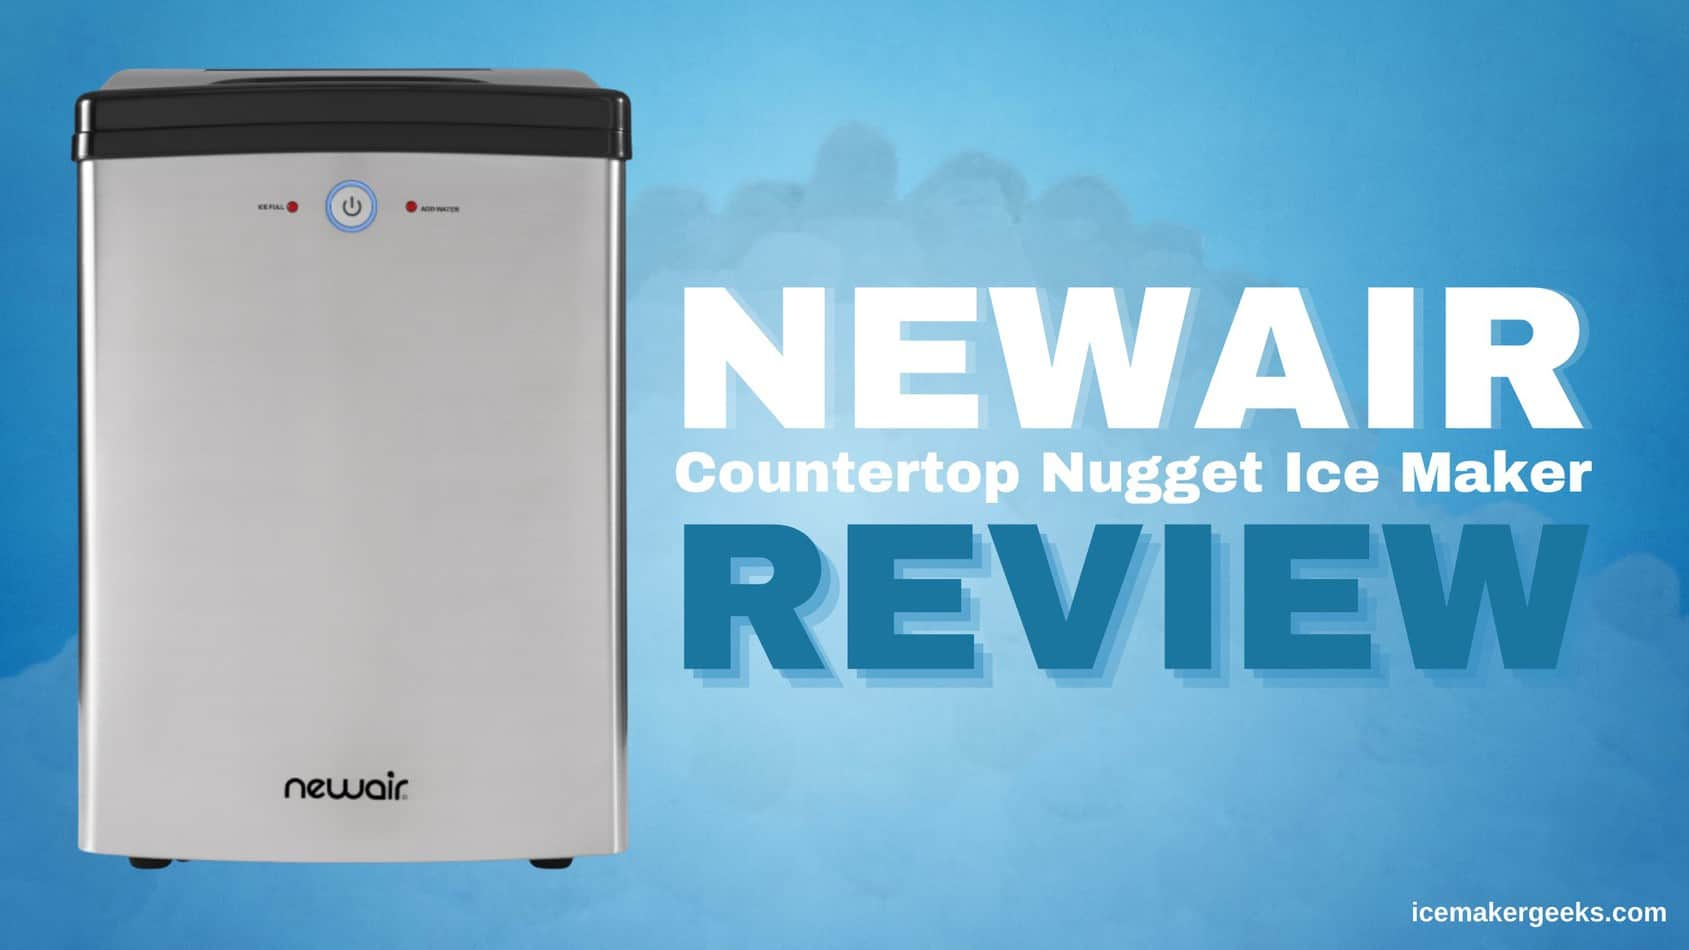 NewAir Countertop Nugget Ice Maker